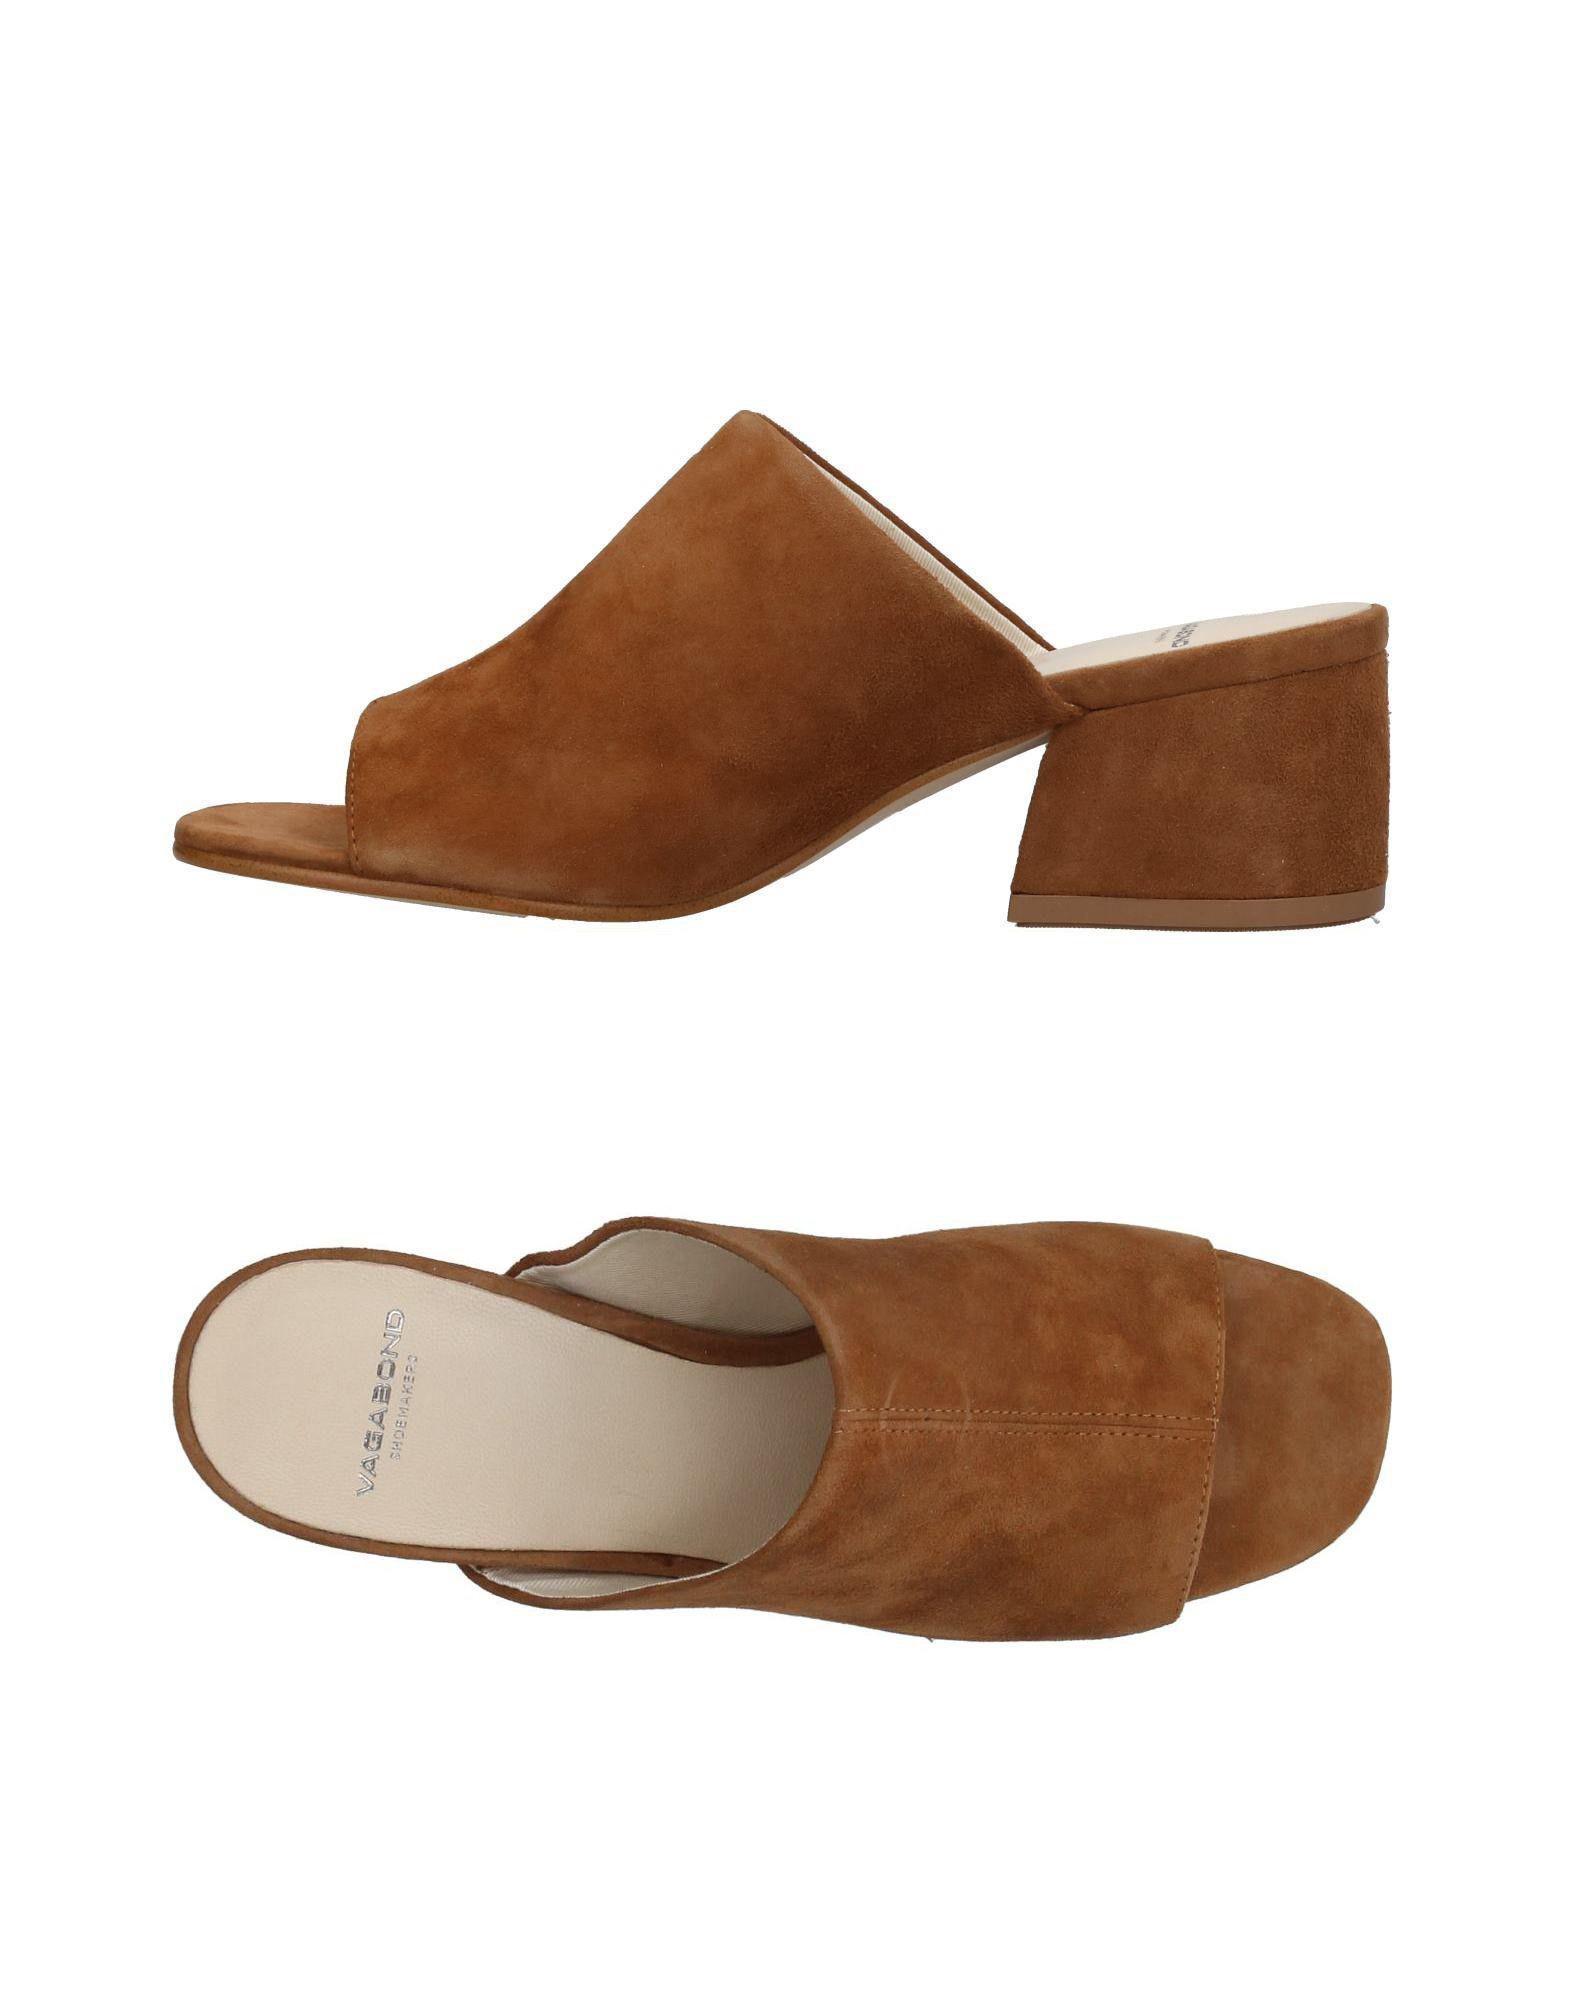 00aa702f1d Vagabond Sandals in Brown - Lyst